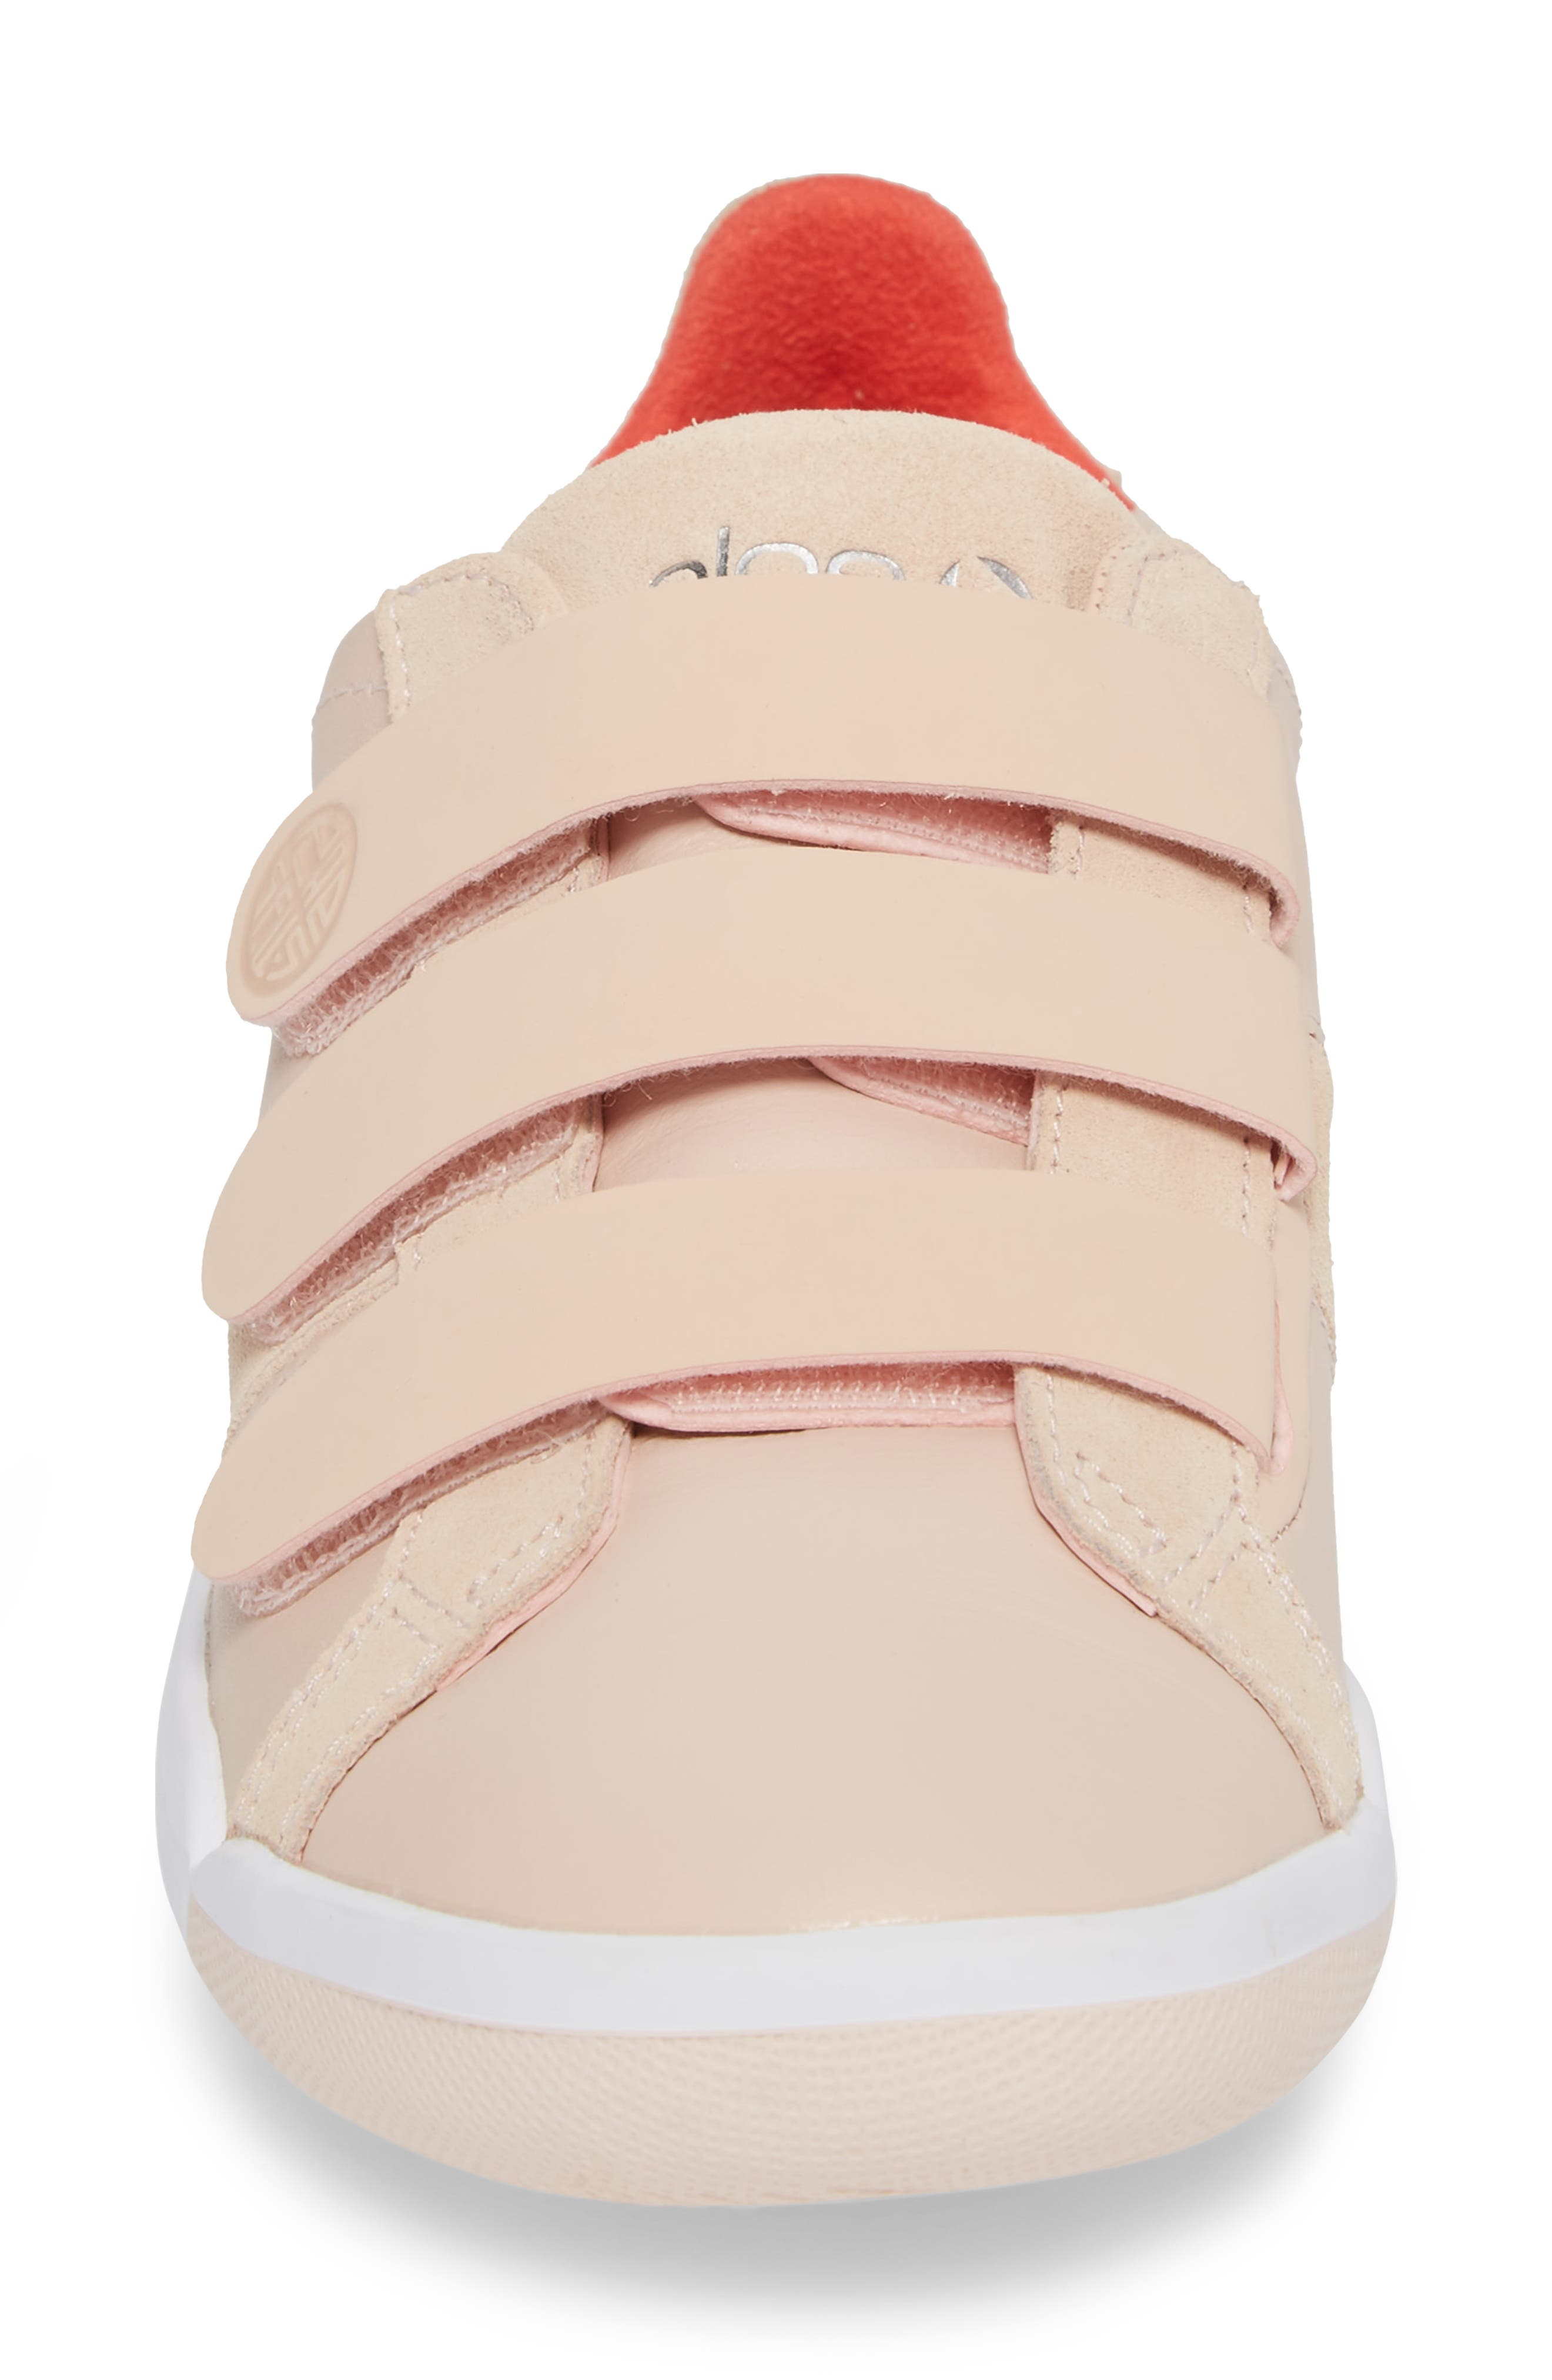 Larkin Sneaker,                             Alternate thumbnail 4, color,                             Cameo Rose Leather